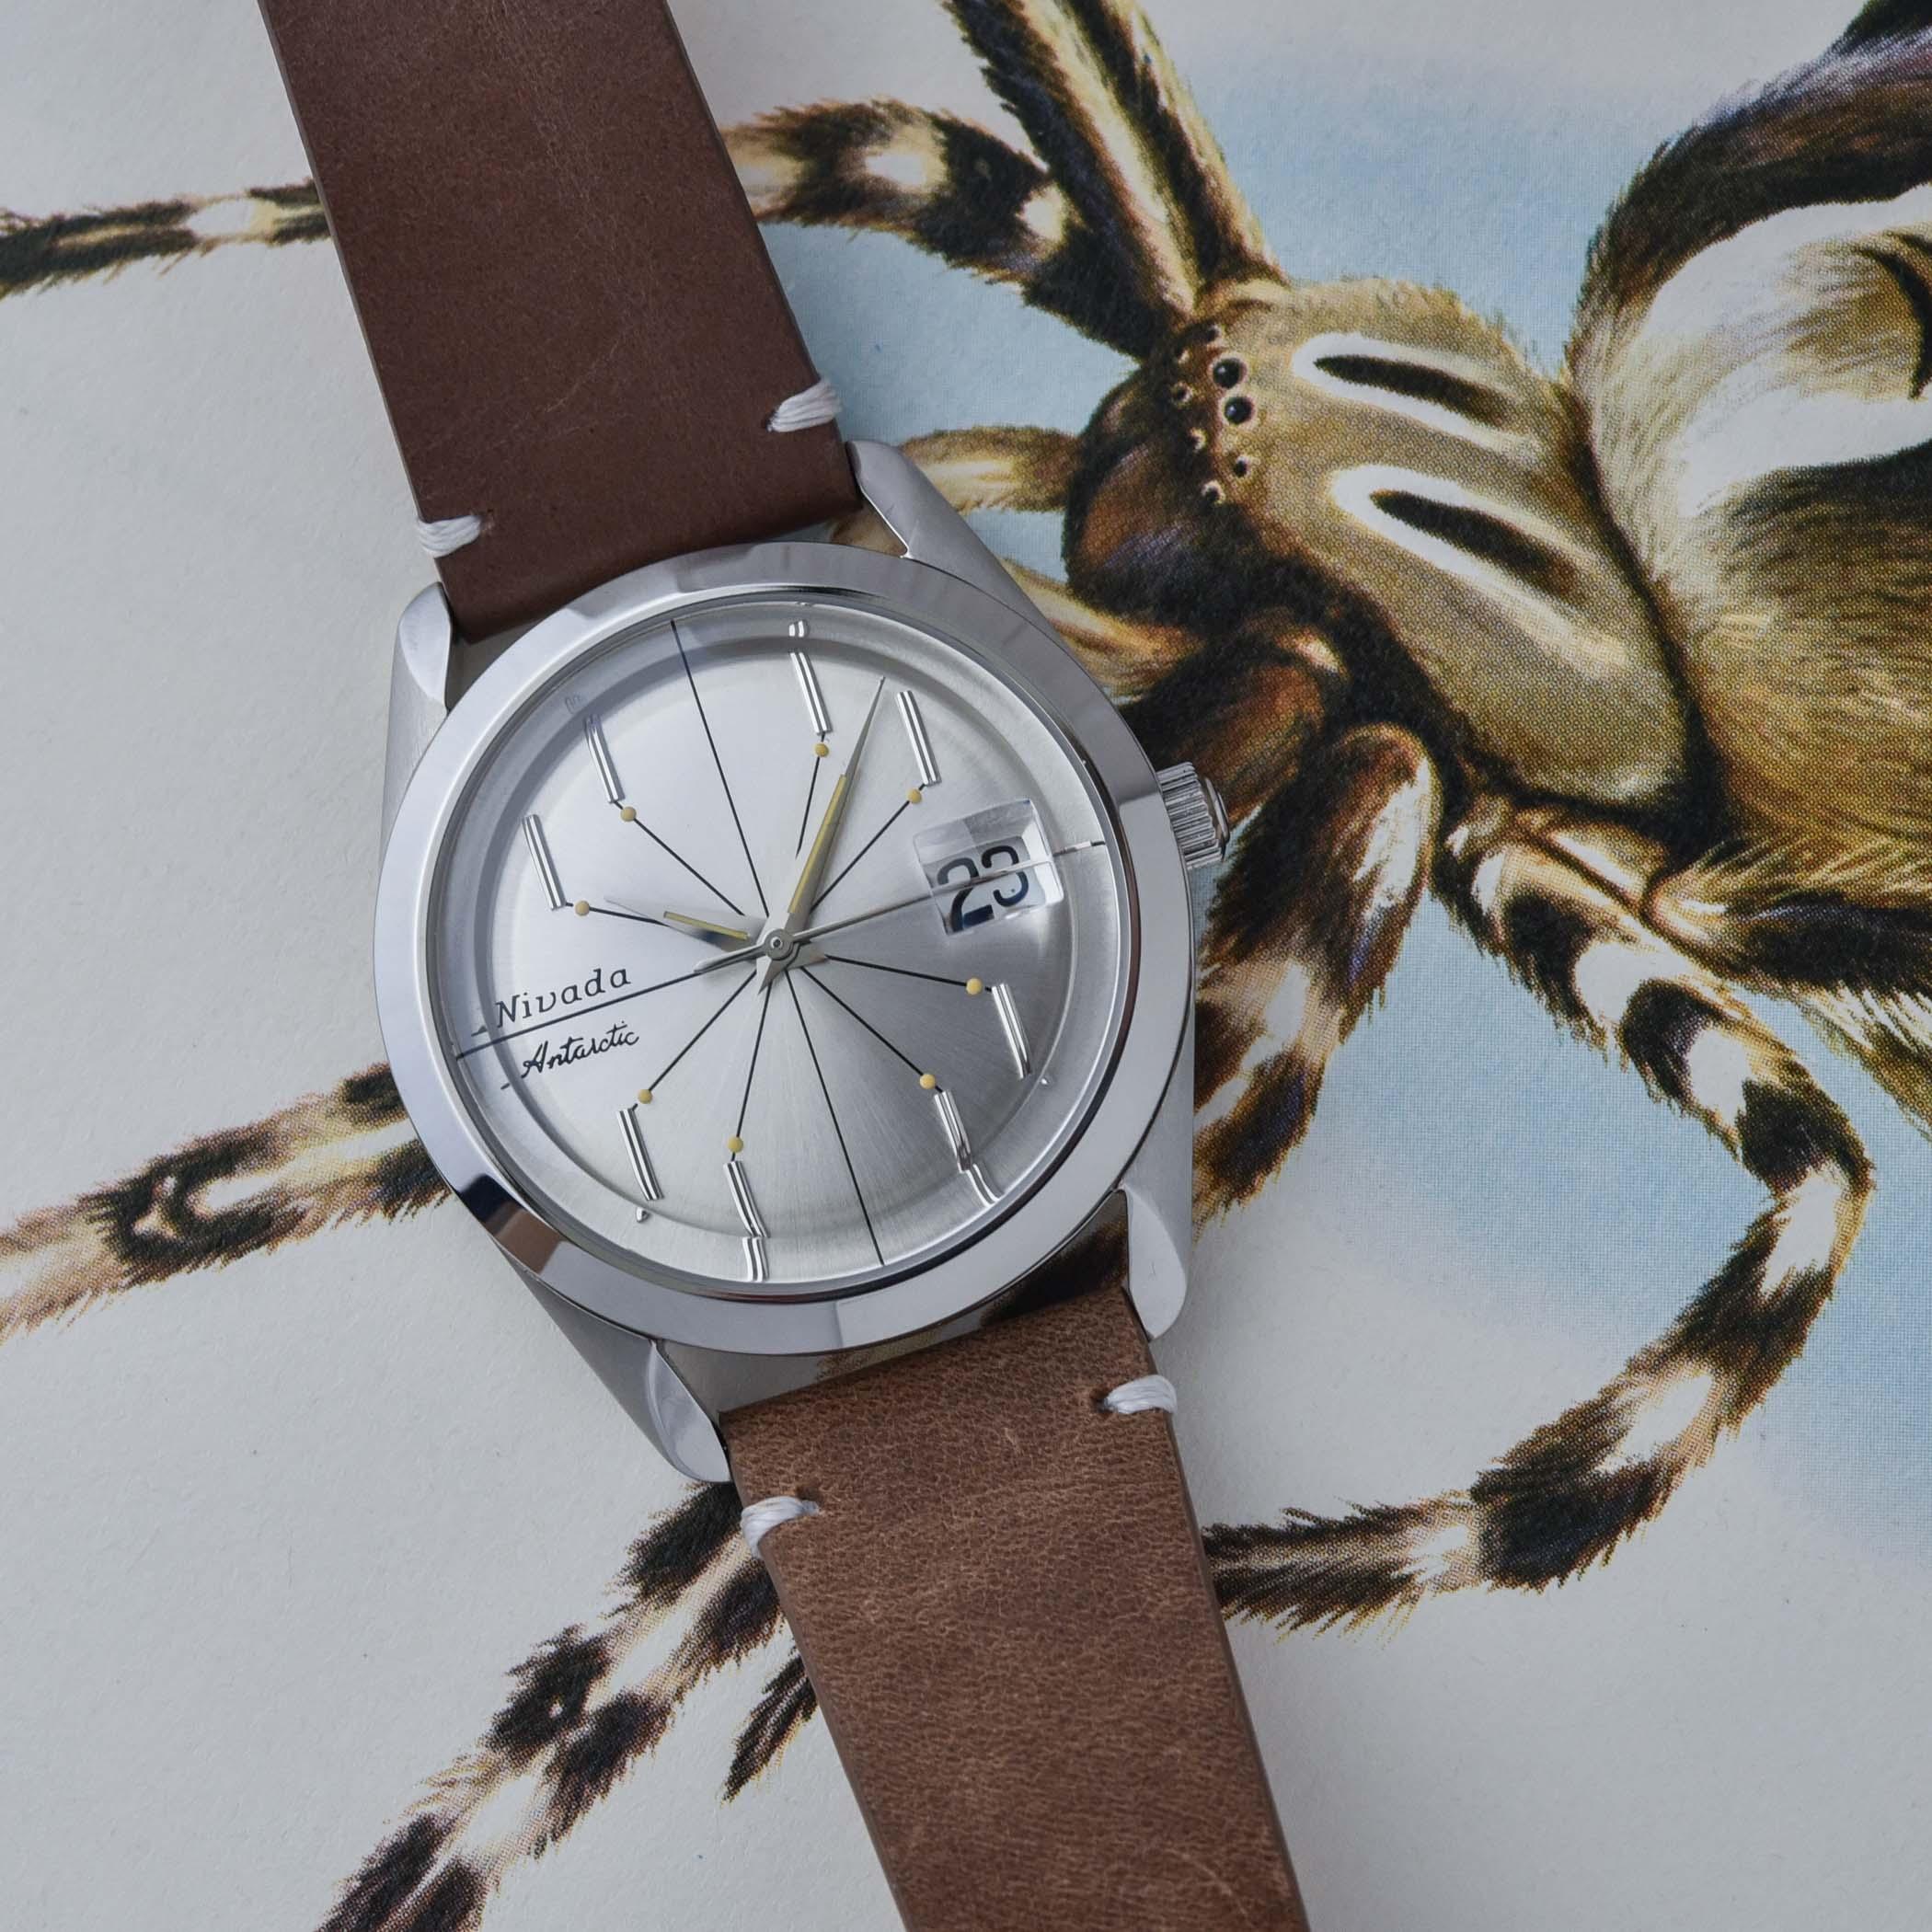 Nivada Grenchen Antarctic Spider